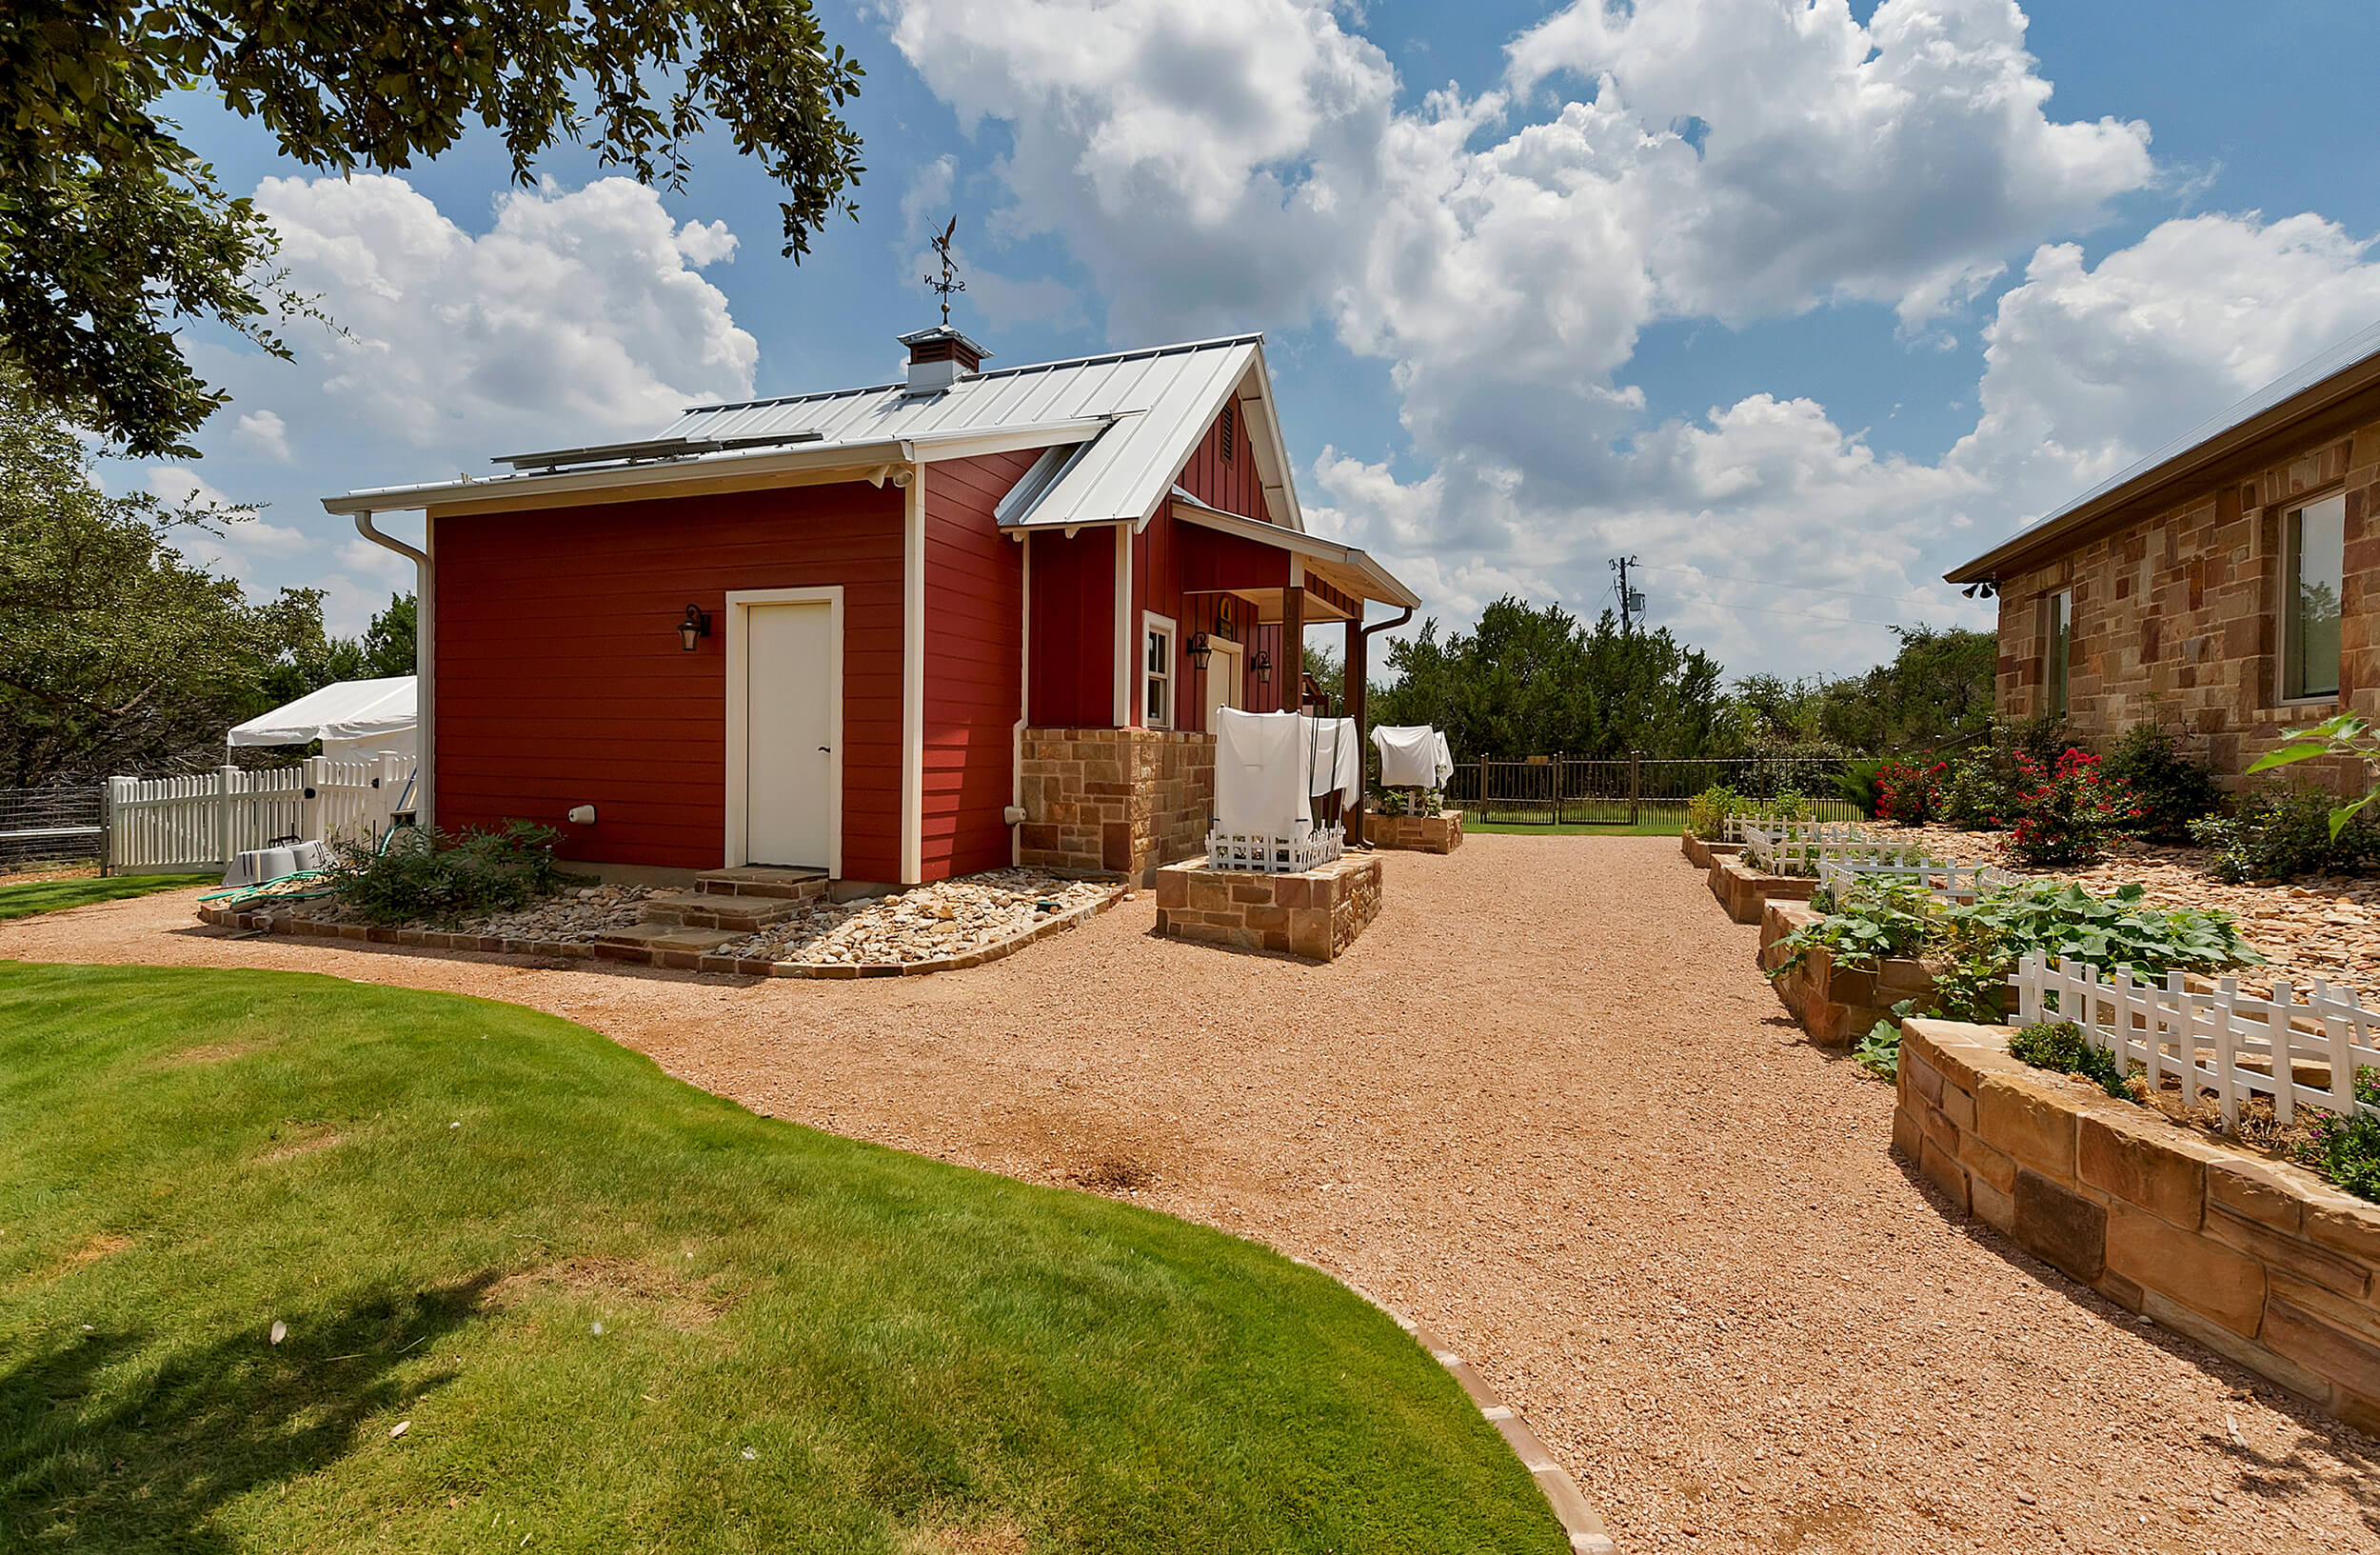 Steve Bumpas Custom Homes Ridgeview 21 Homebuilder Remodel Granbury Brazos Bend Cresson DeCordova Pecan Plantation Tolar Glen Rose Fort Worth.jpg